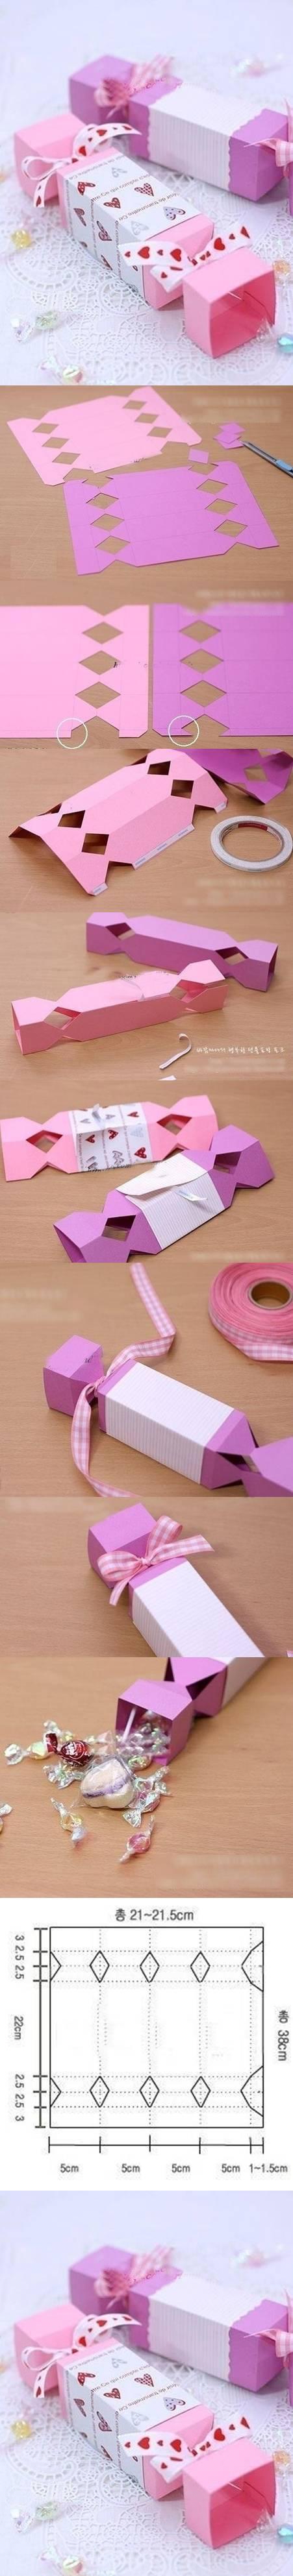 DIY Cute Candy Gift Box DIY Projects | UsefulDIY.com